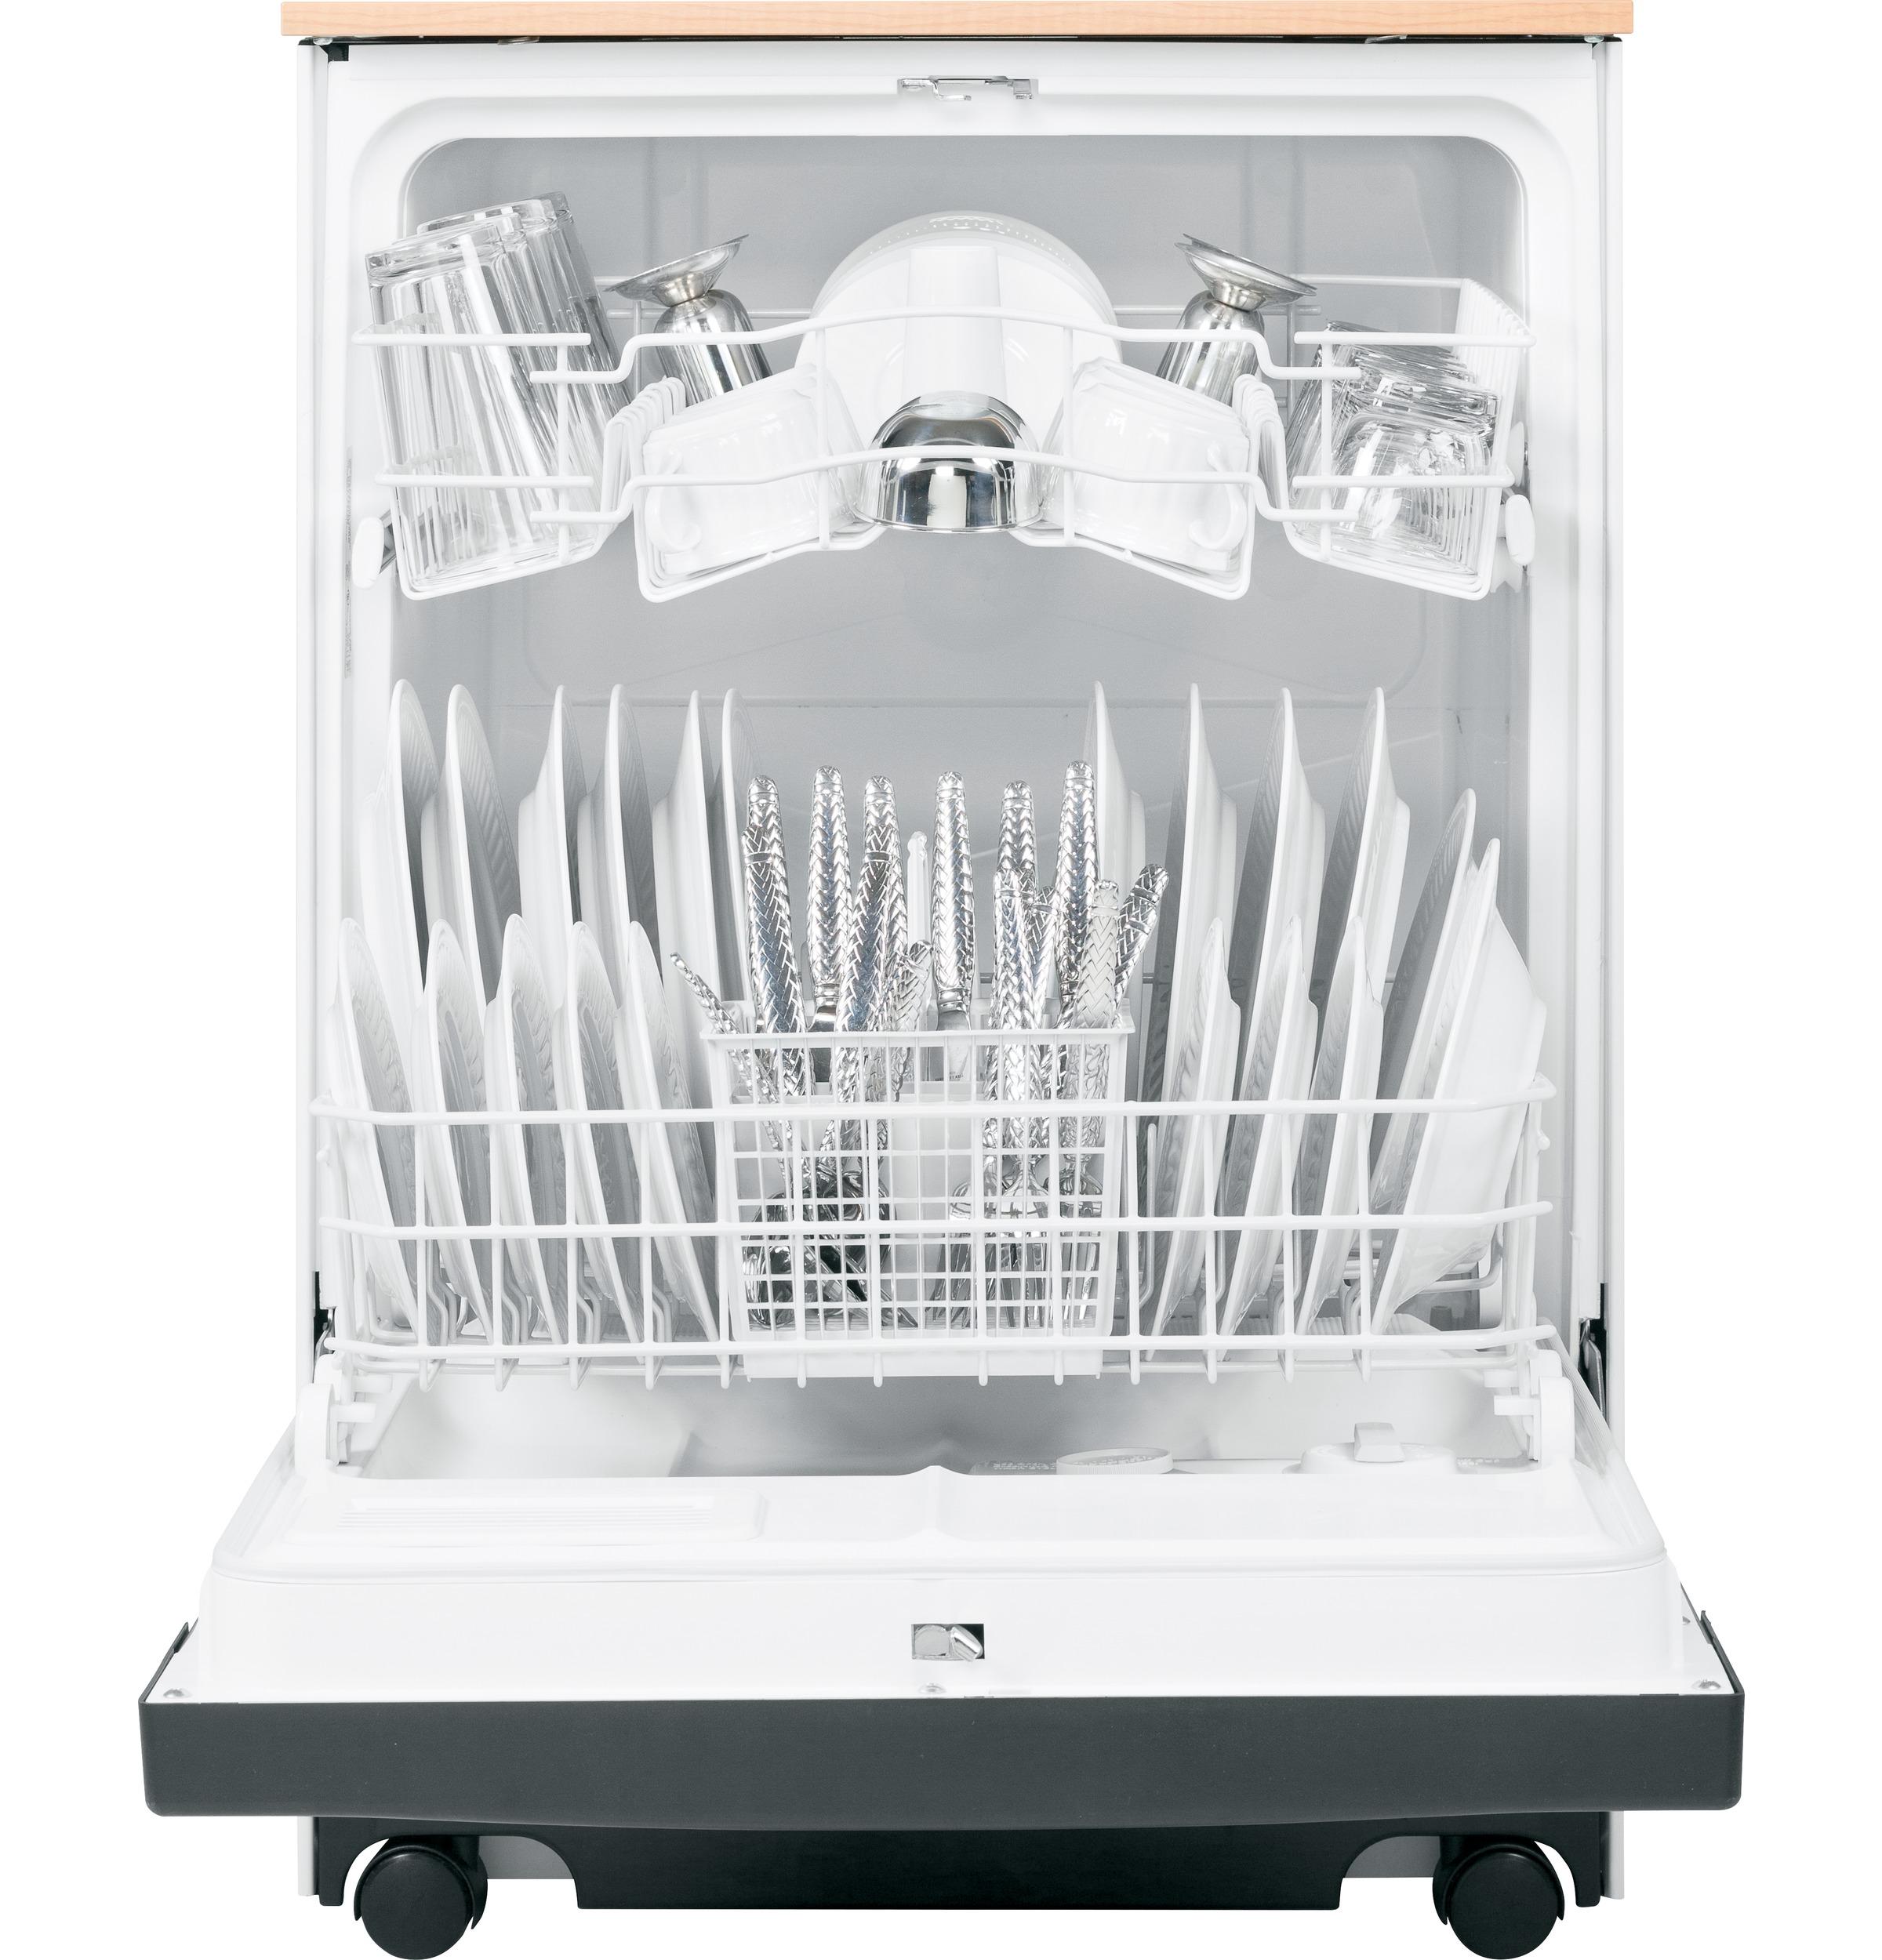 Model: GSC3500DBB | GE GE® Convertible/Portable Dishwasher